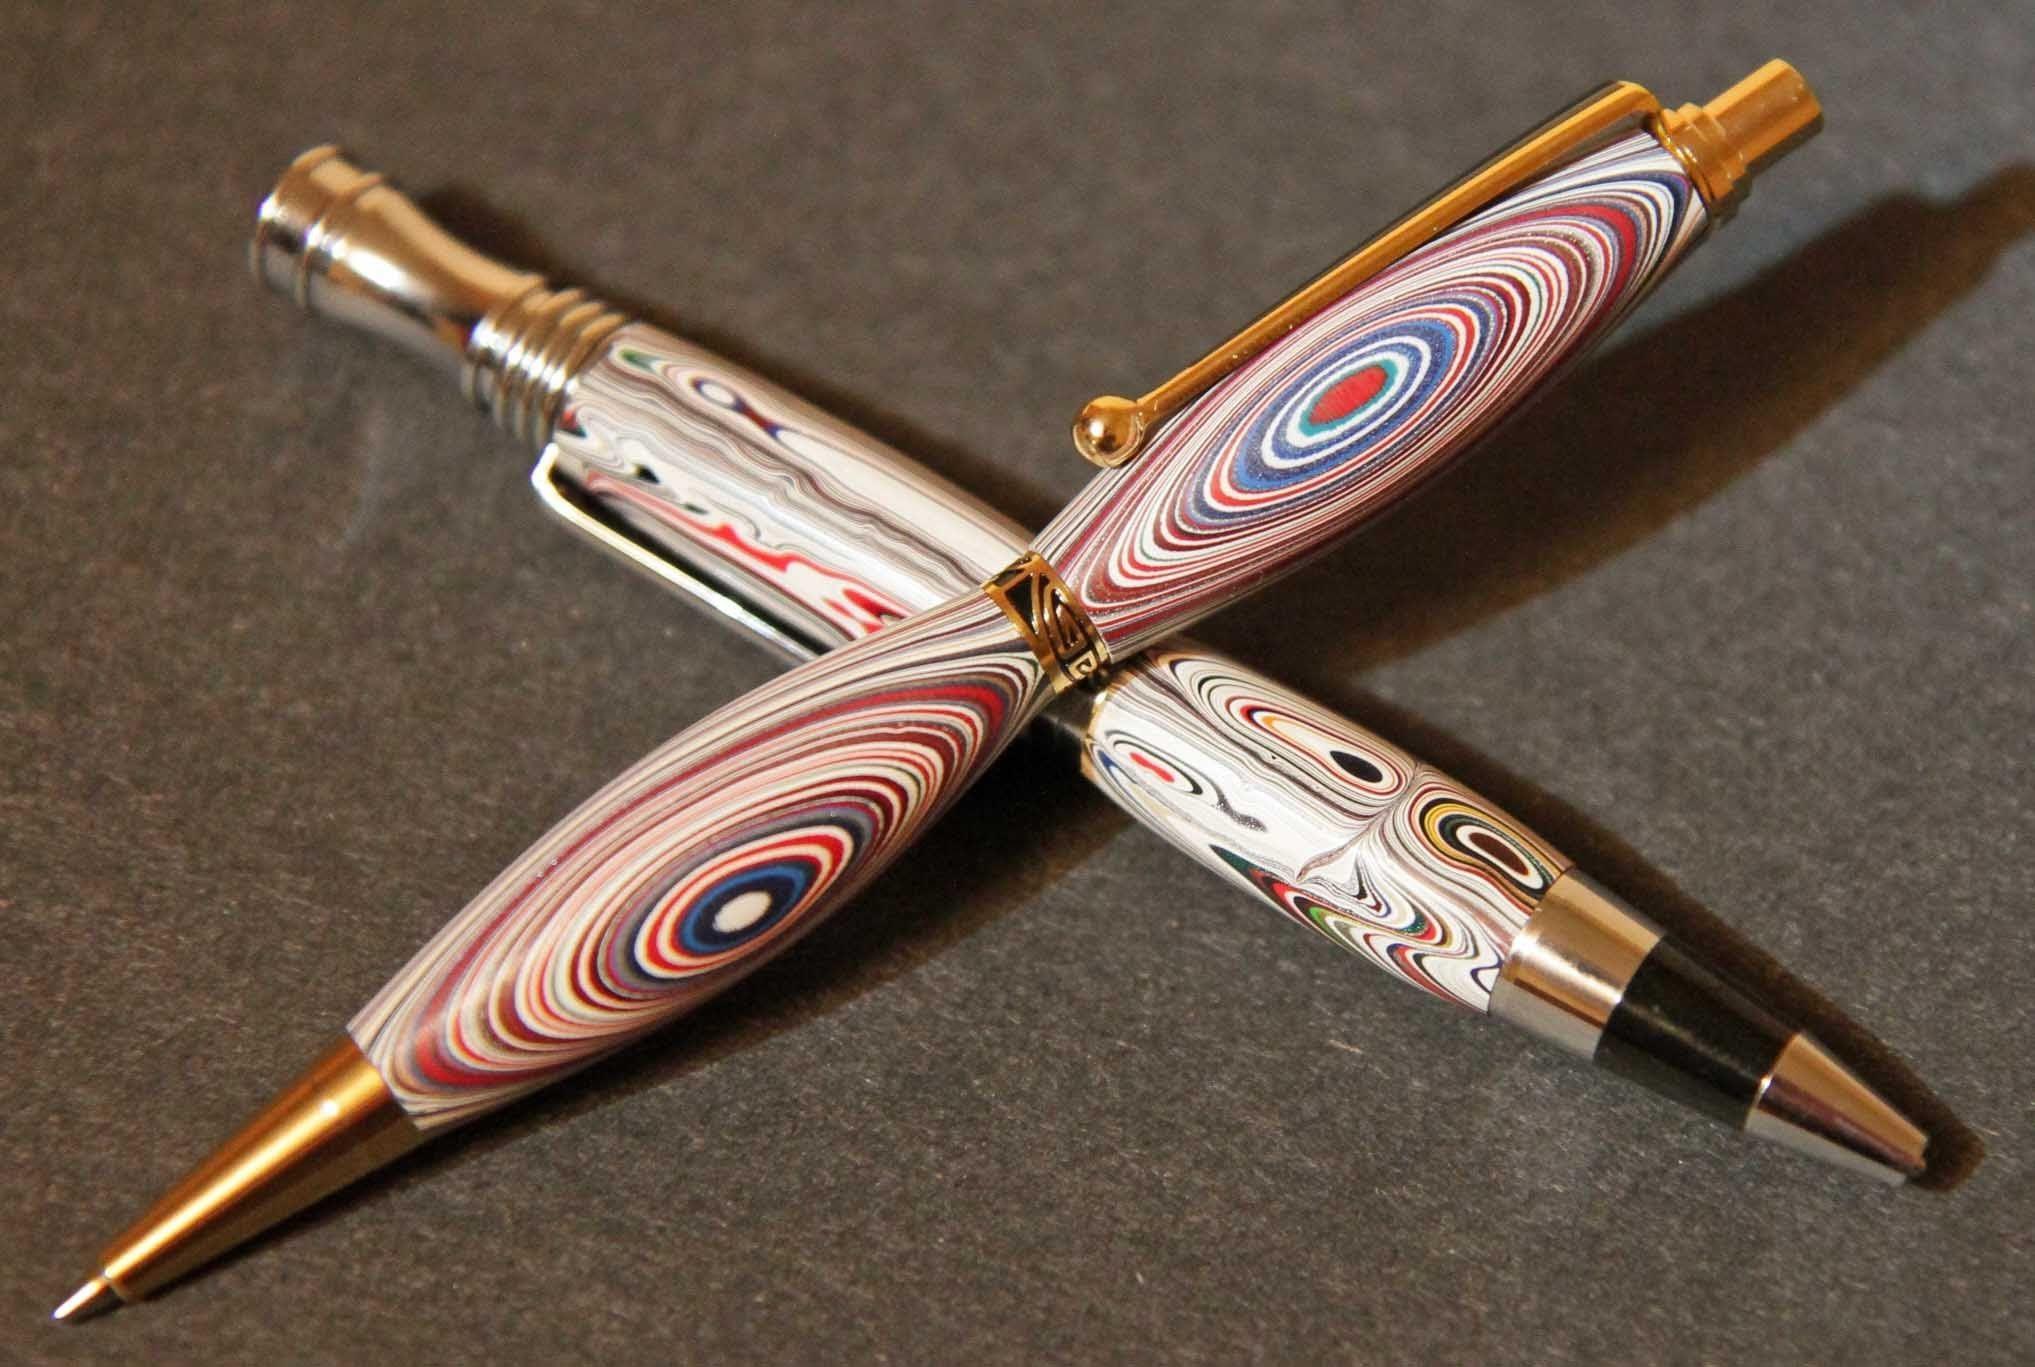 Craft pens to write on wood - Wood Turning Automotive Paint Pen Playlist